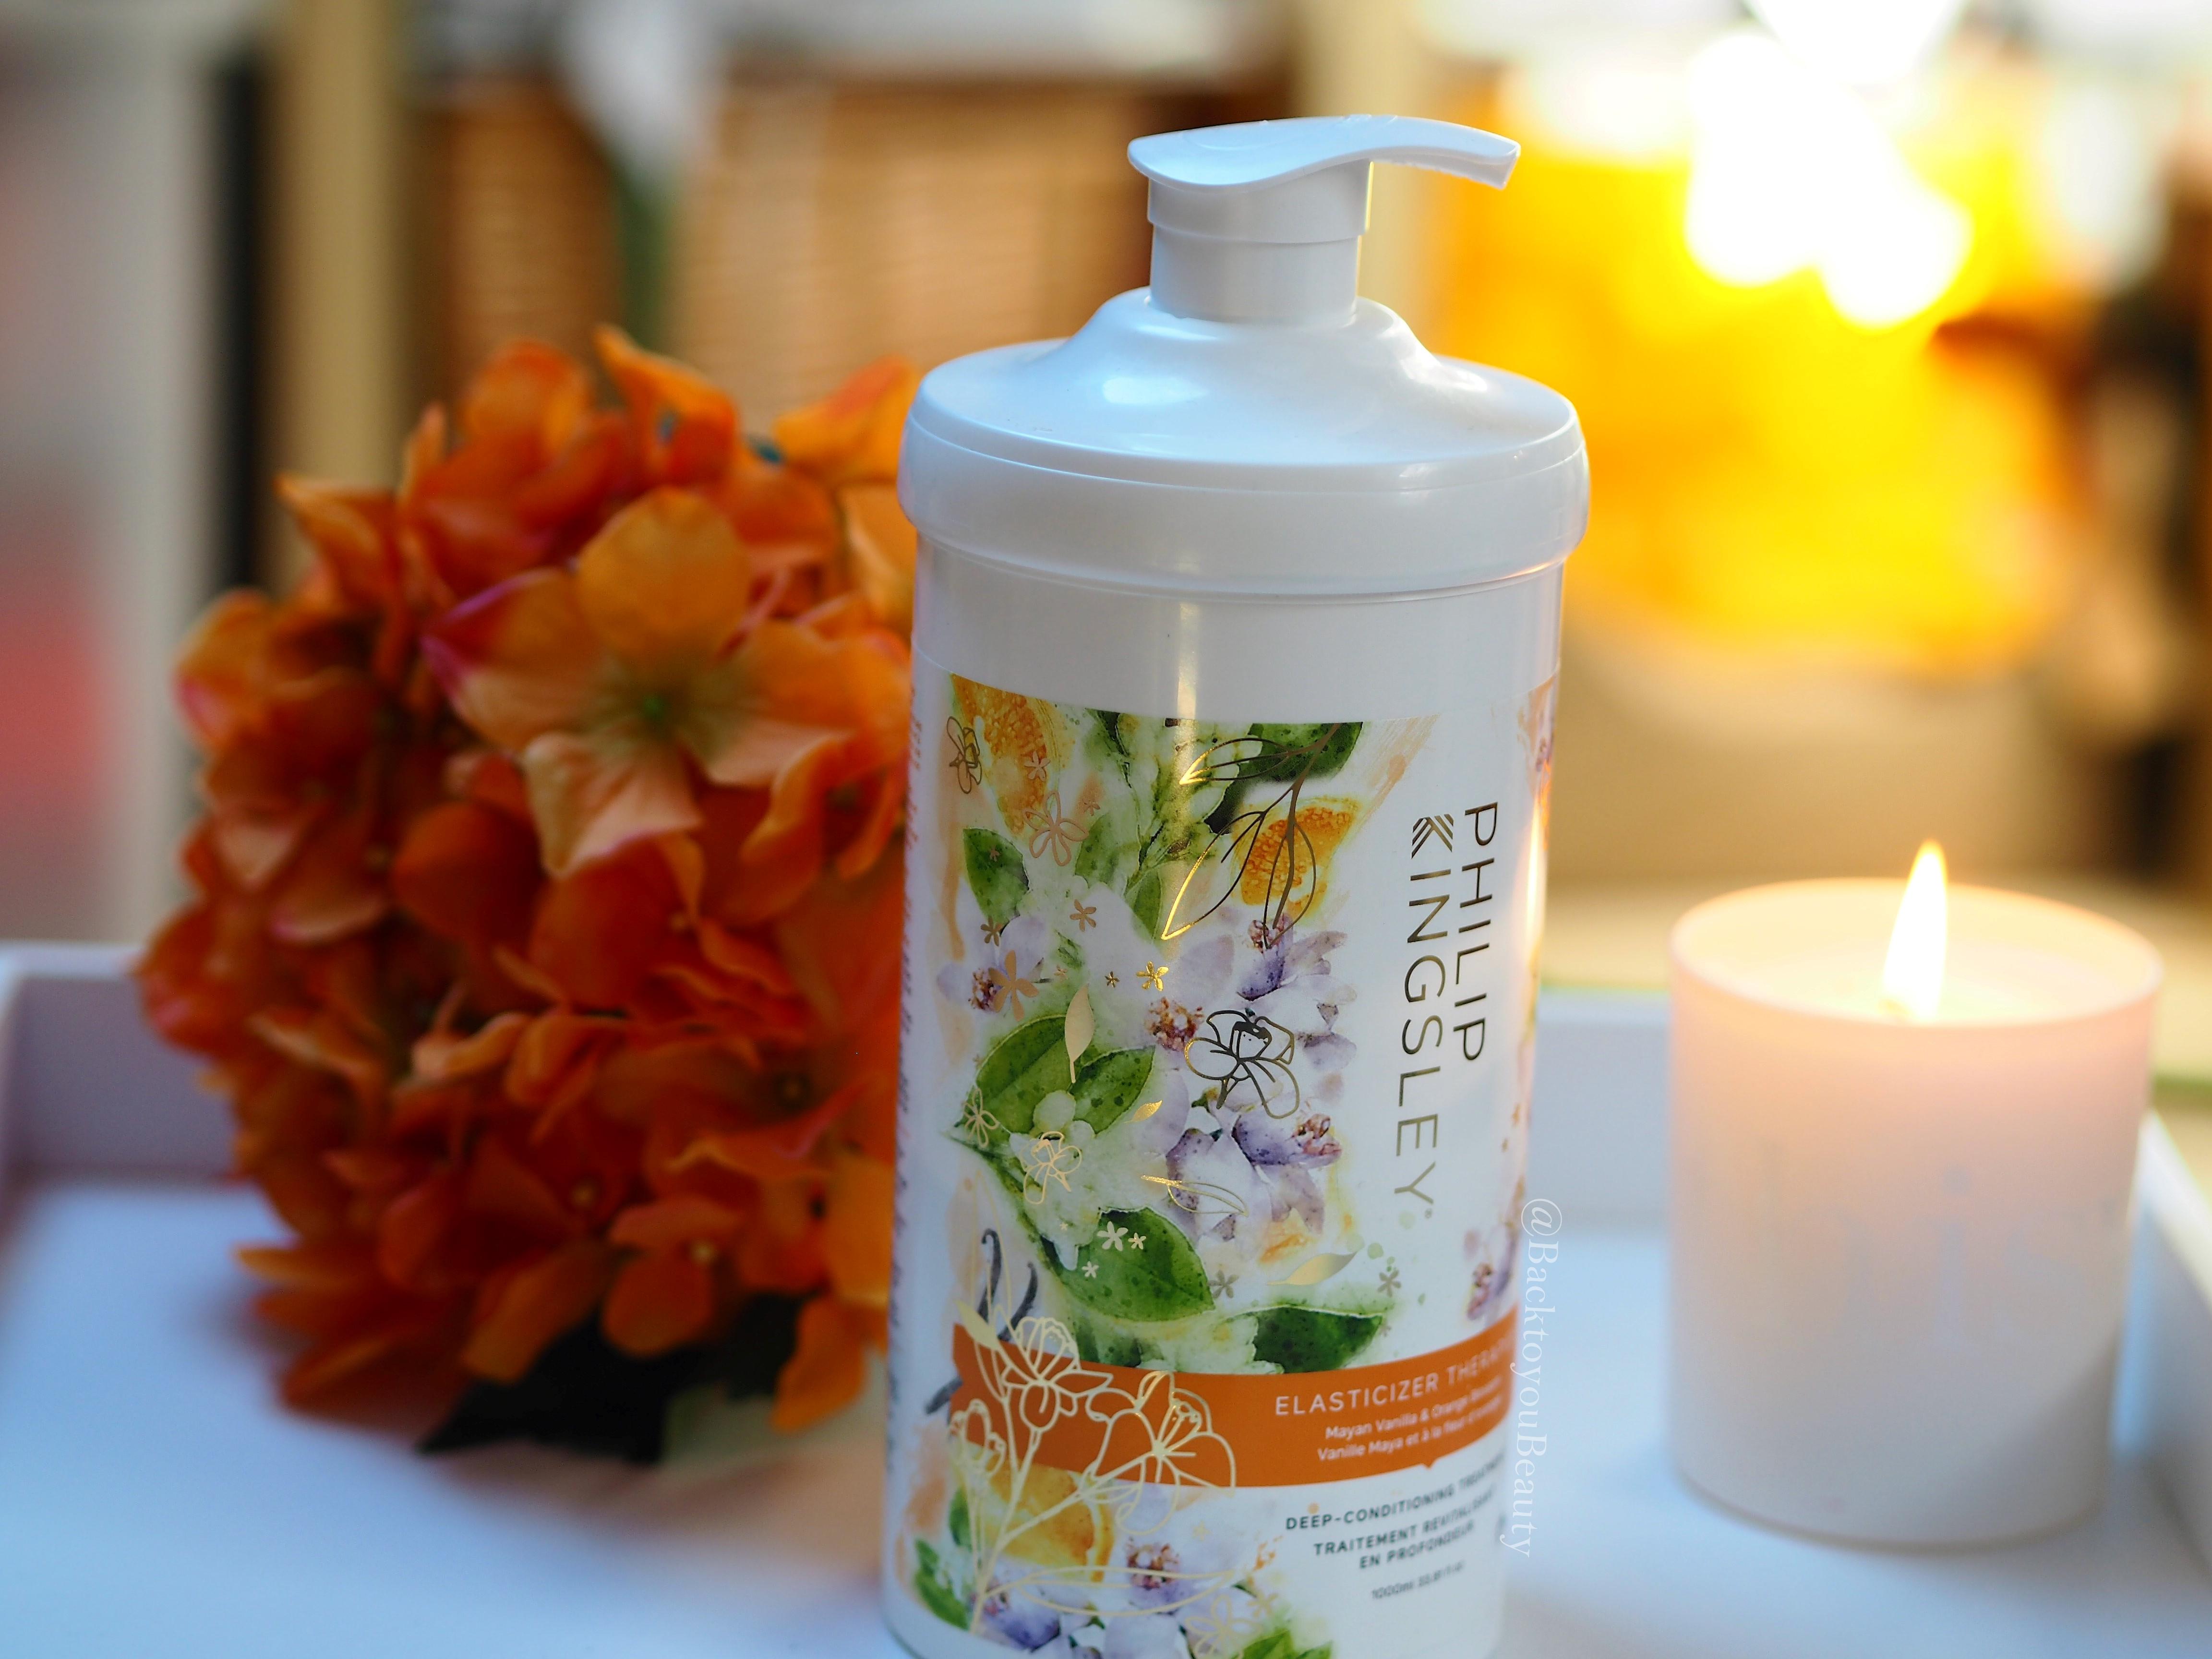 Mayan Vanilla & Orange Blossom Elasticizer